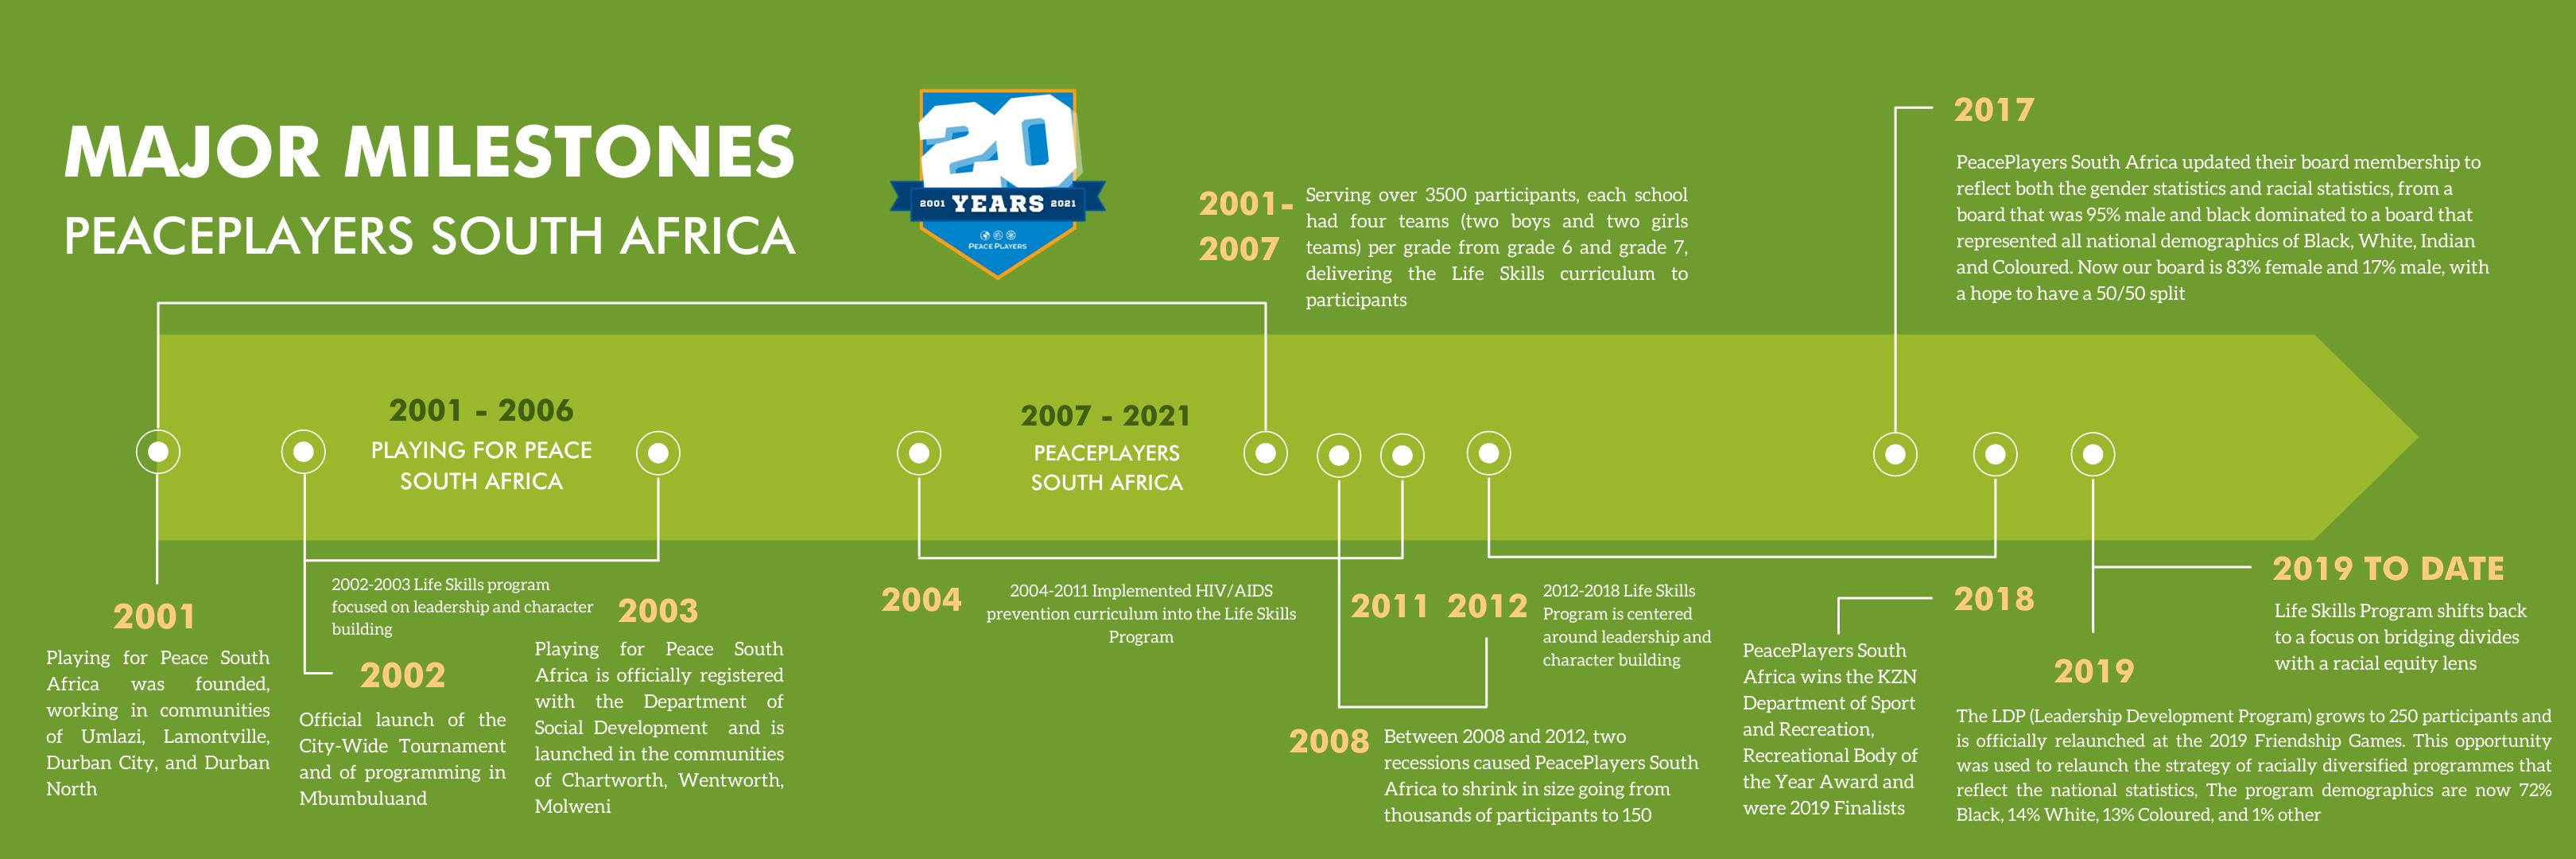 PeacePlayers South Africa Milestones